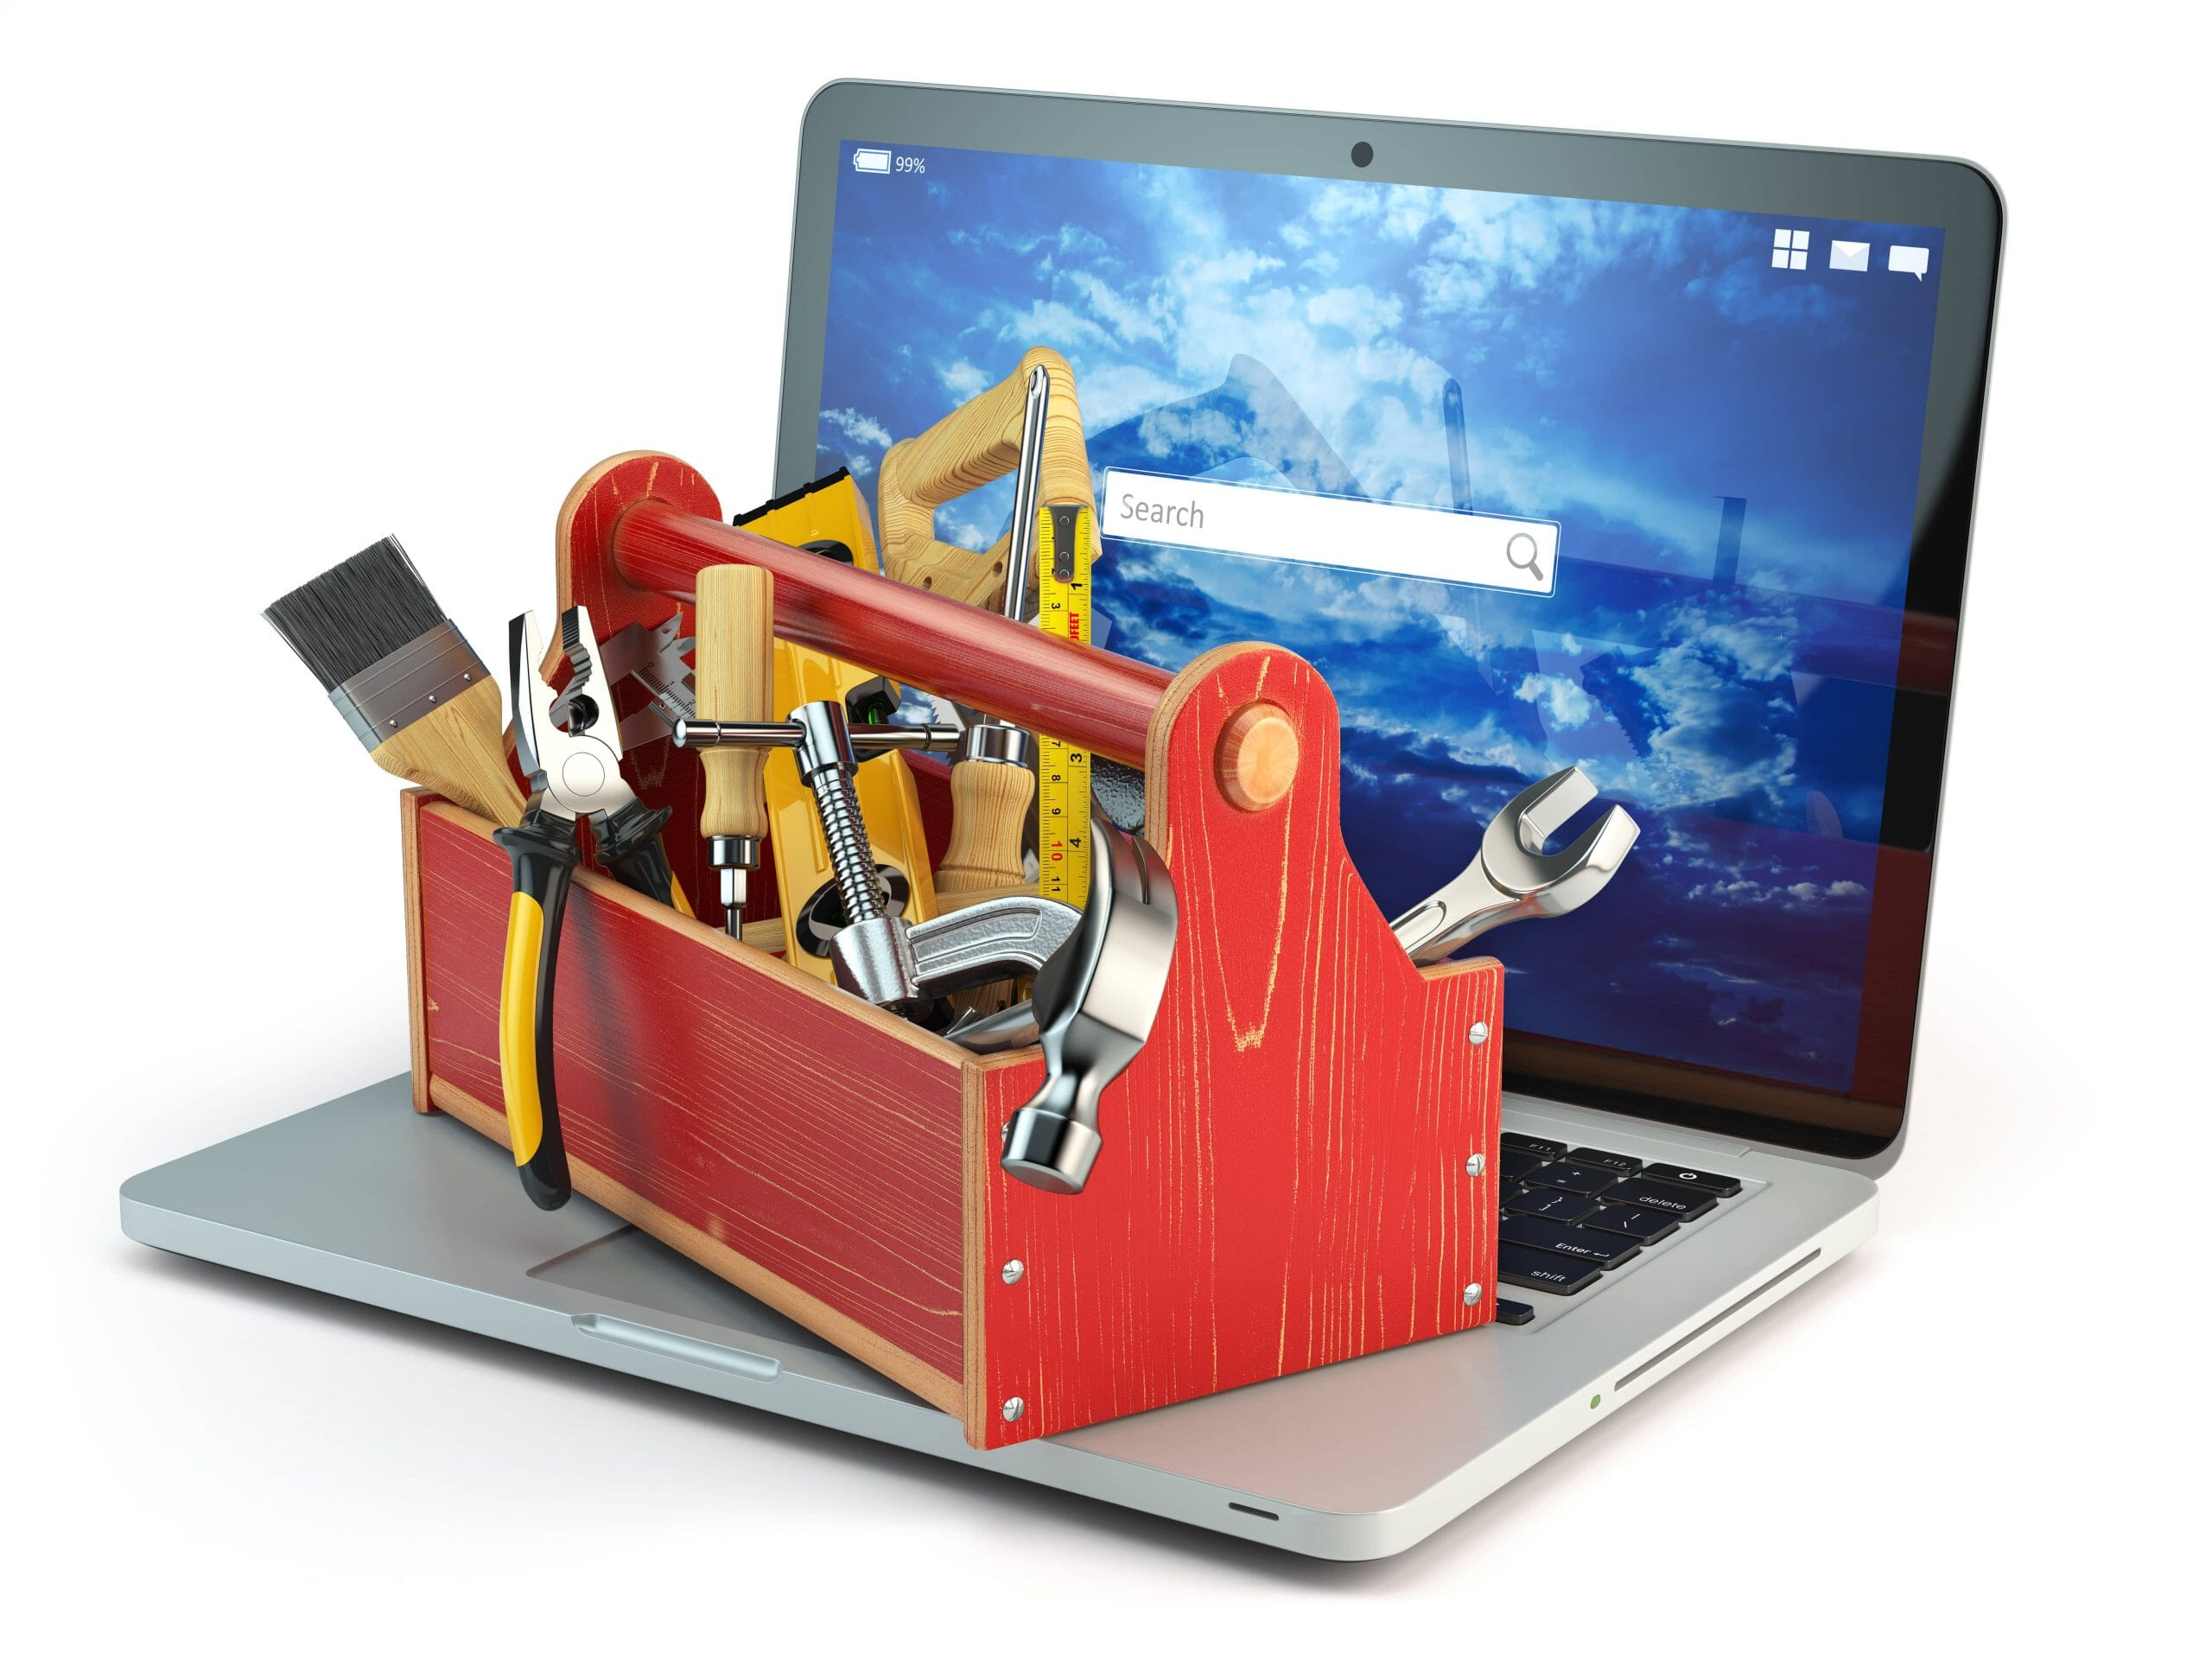 Best tools: Web designers need to make websites